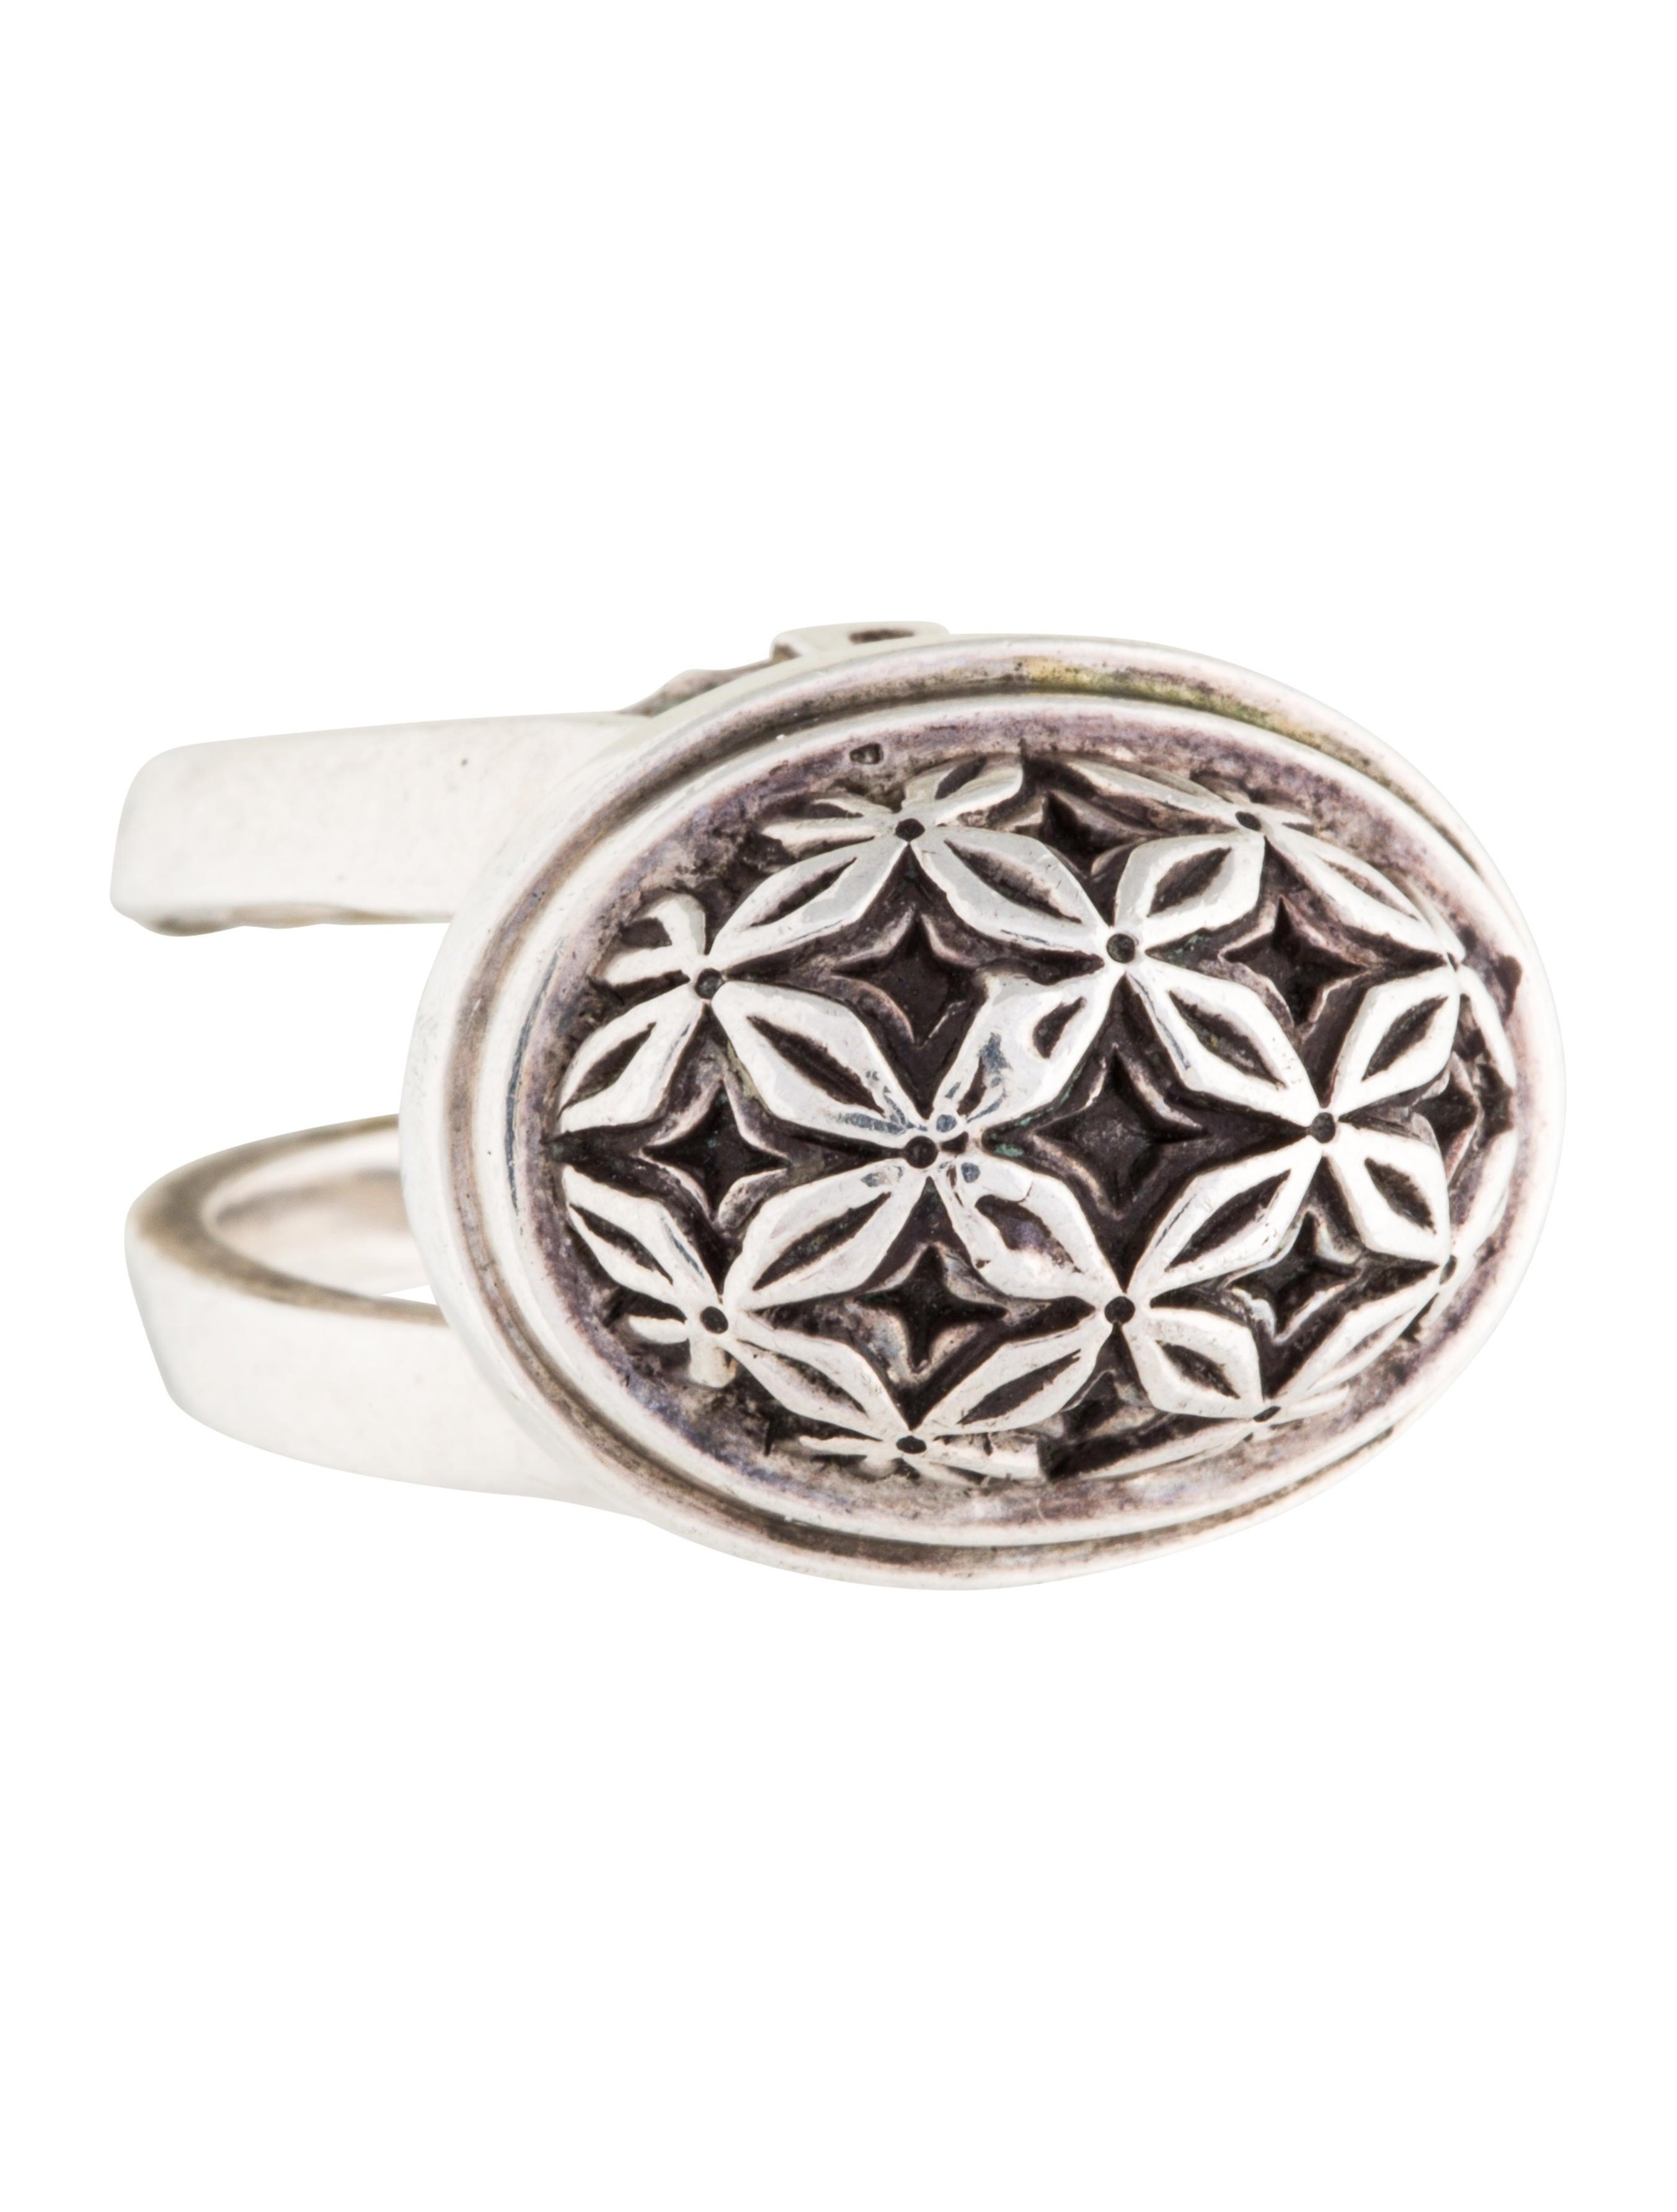 Michael Dawkins Jewelry Rings